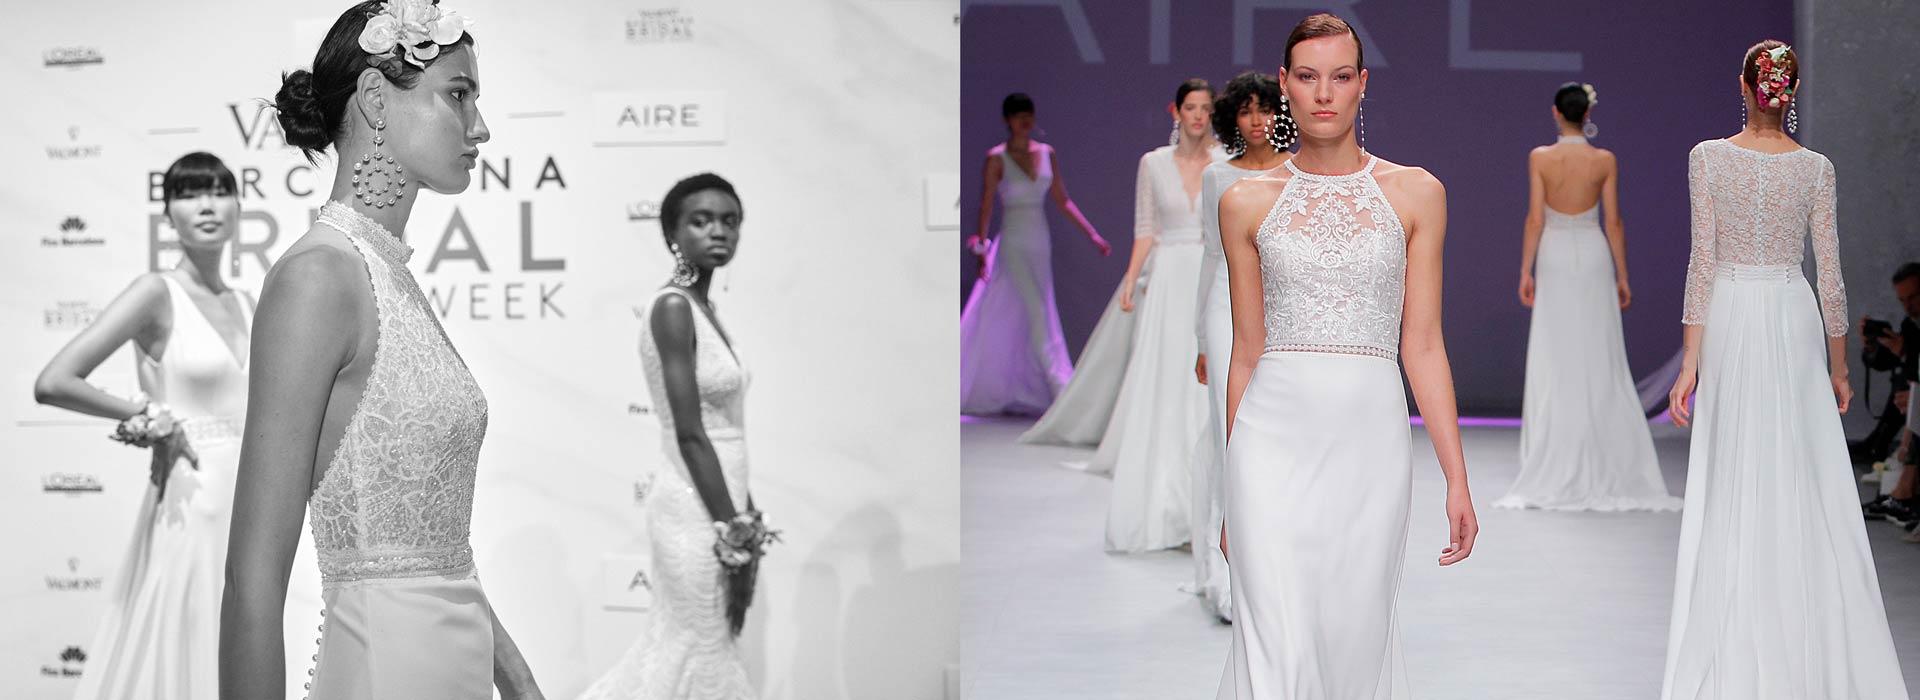 Aire Barcelona Fashionshow